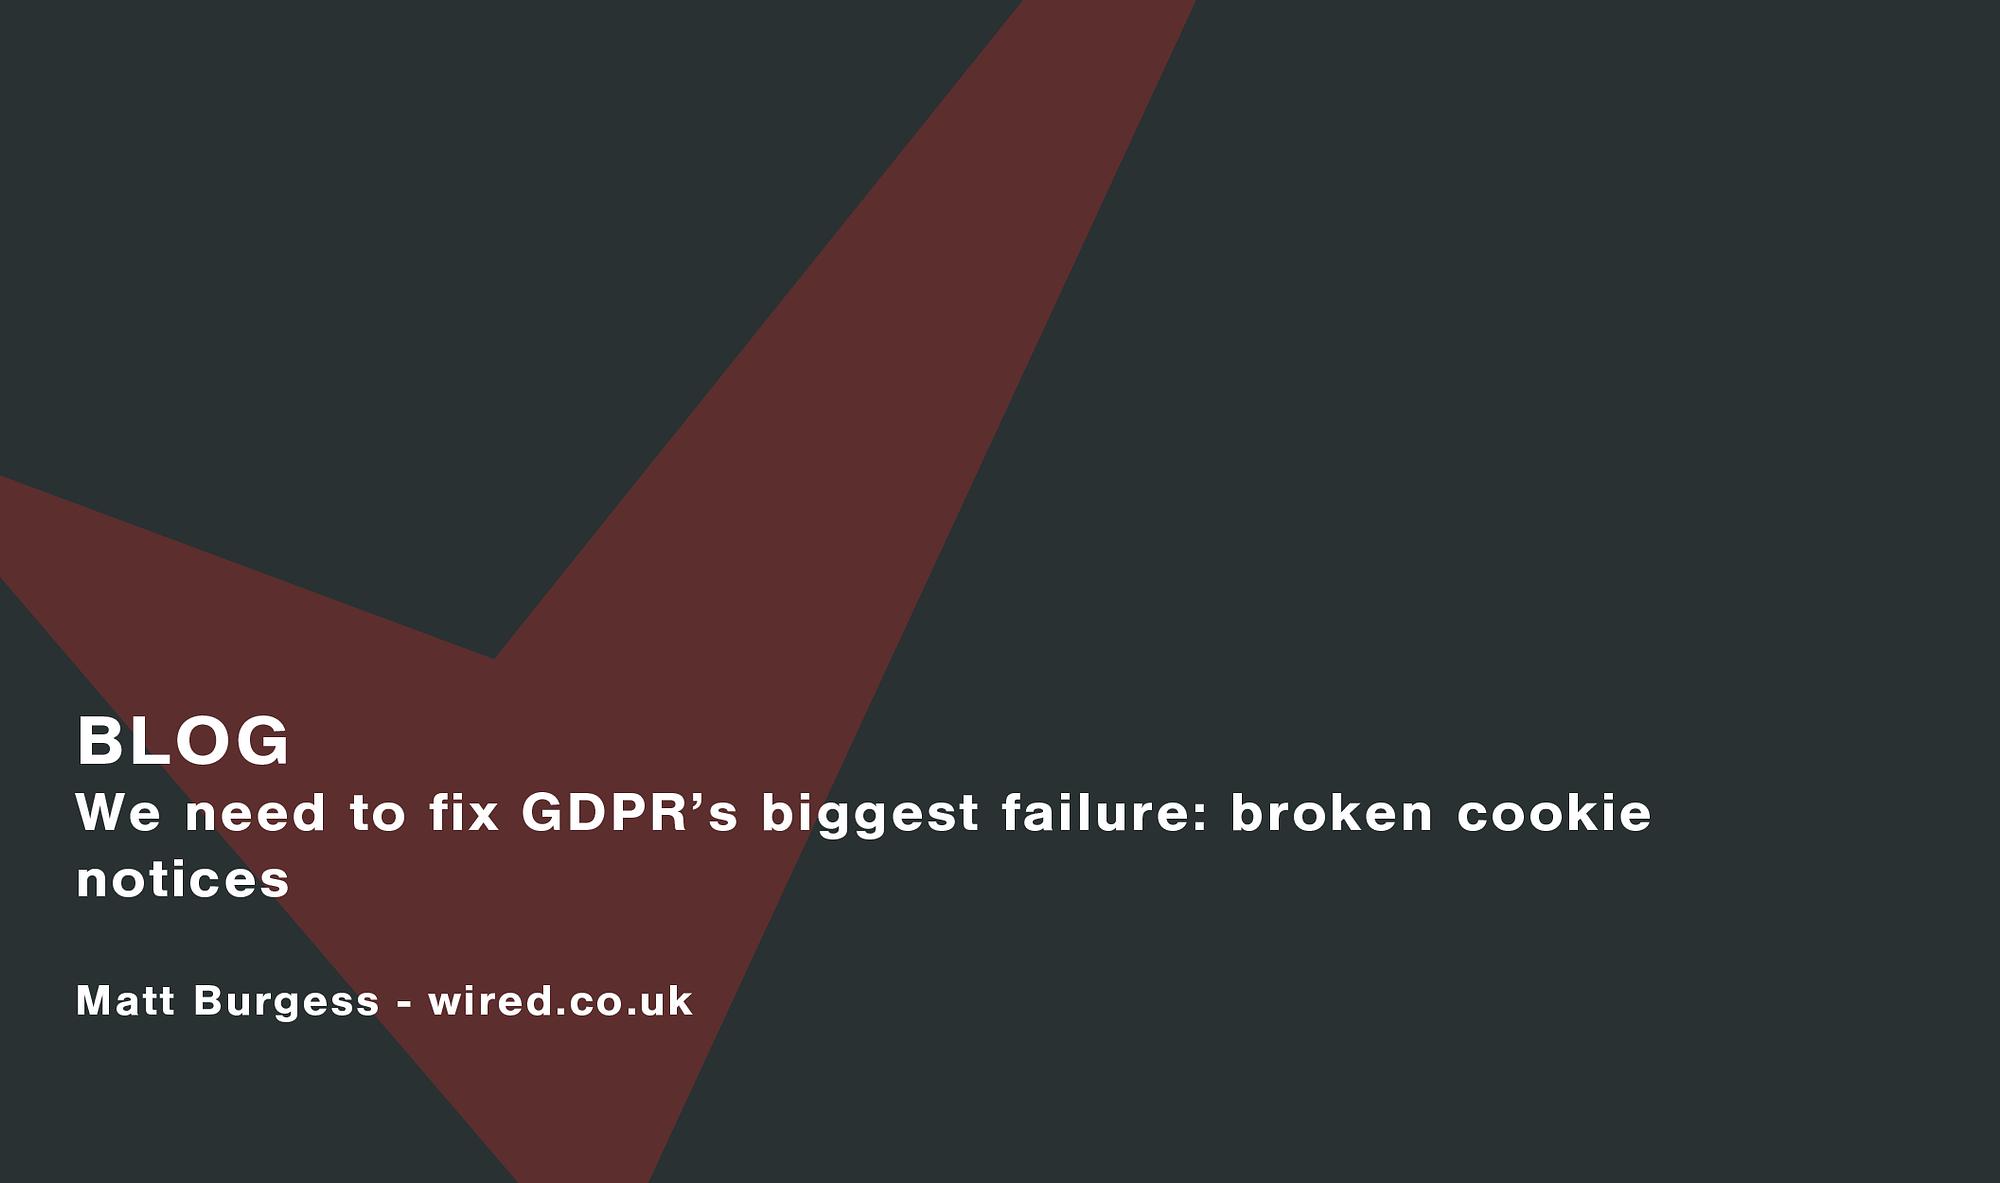 We-need-to-fix-GDPRs-biggest-failure-broken-cookie-notices